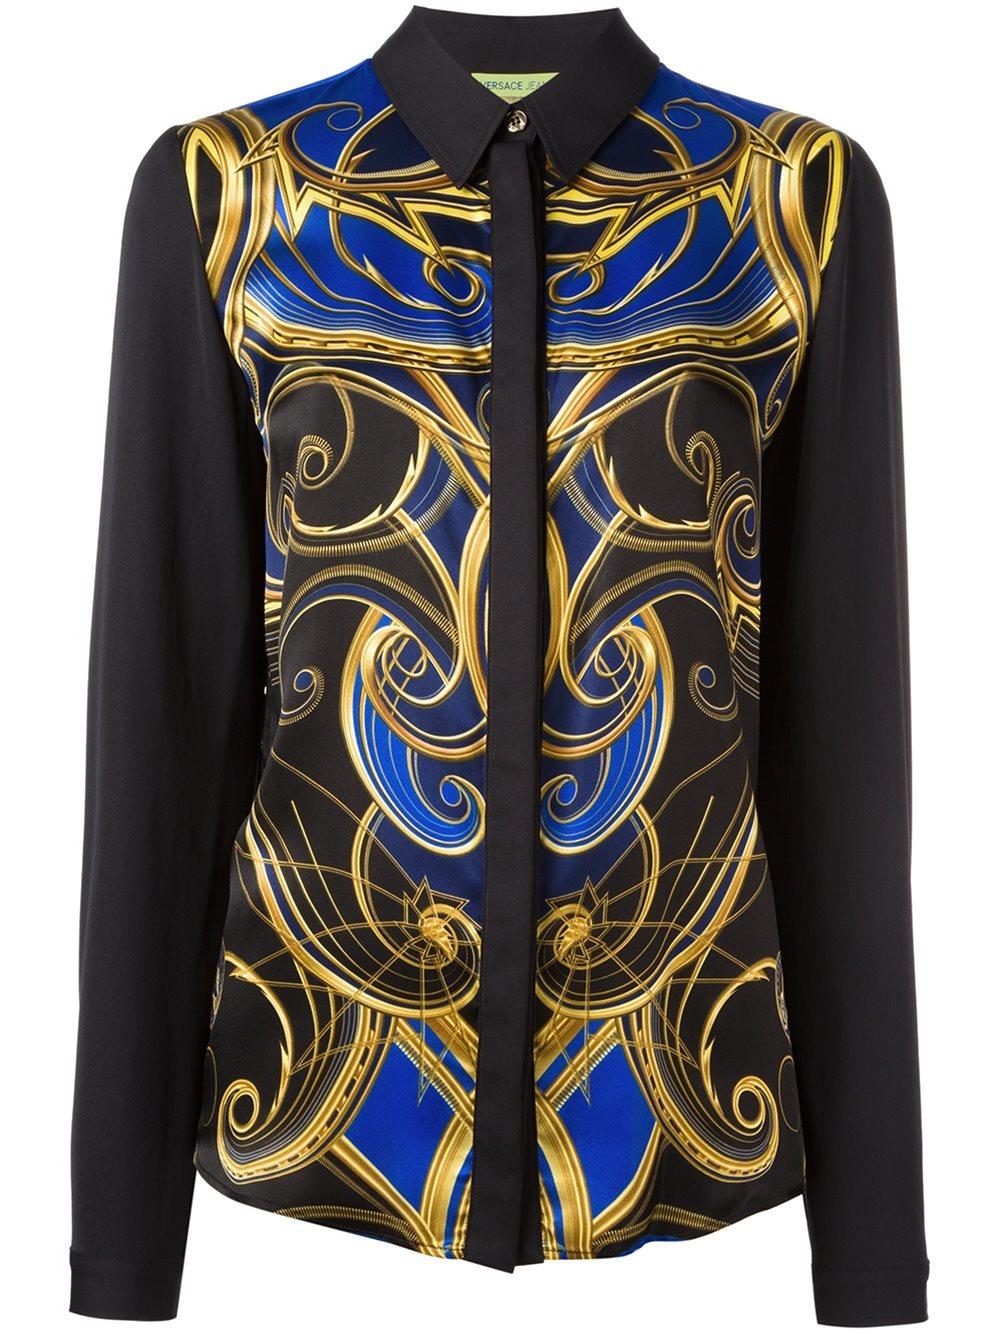 Versace jeans ornate print shirt lyst for Versace t shirts women